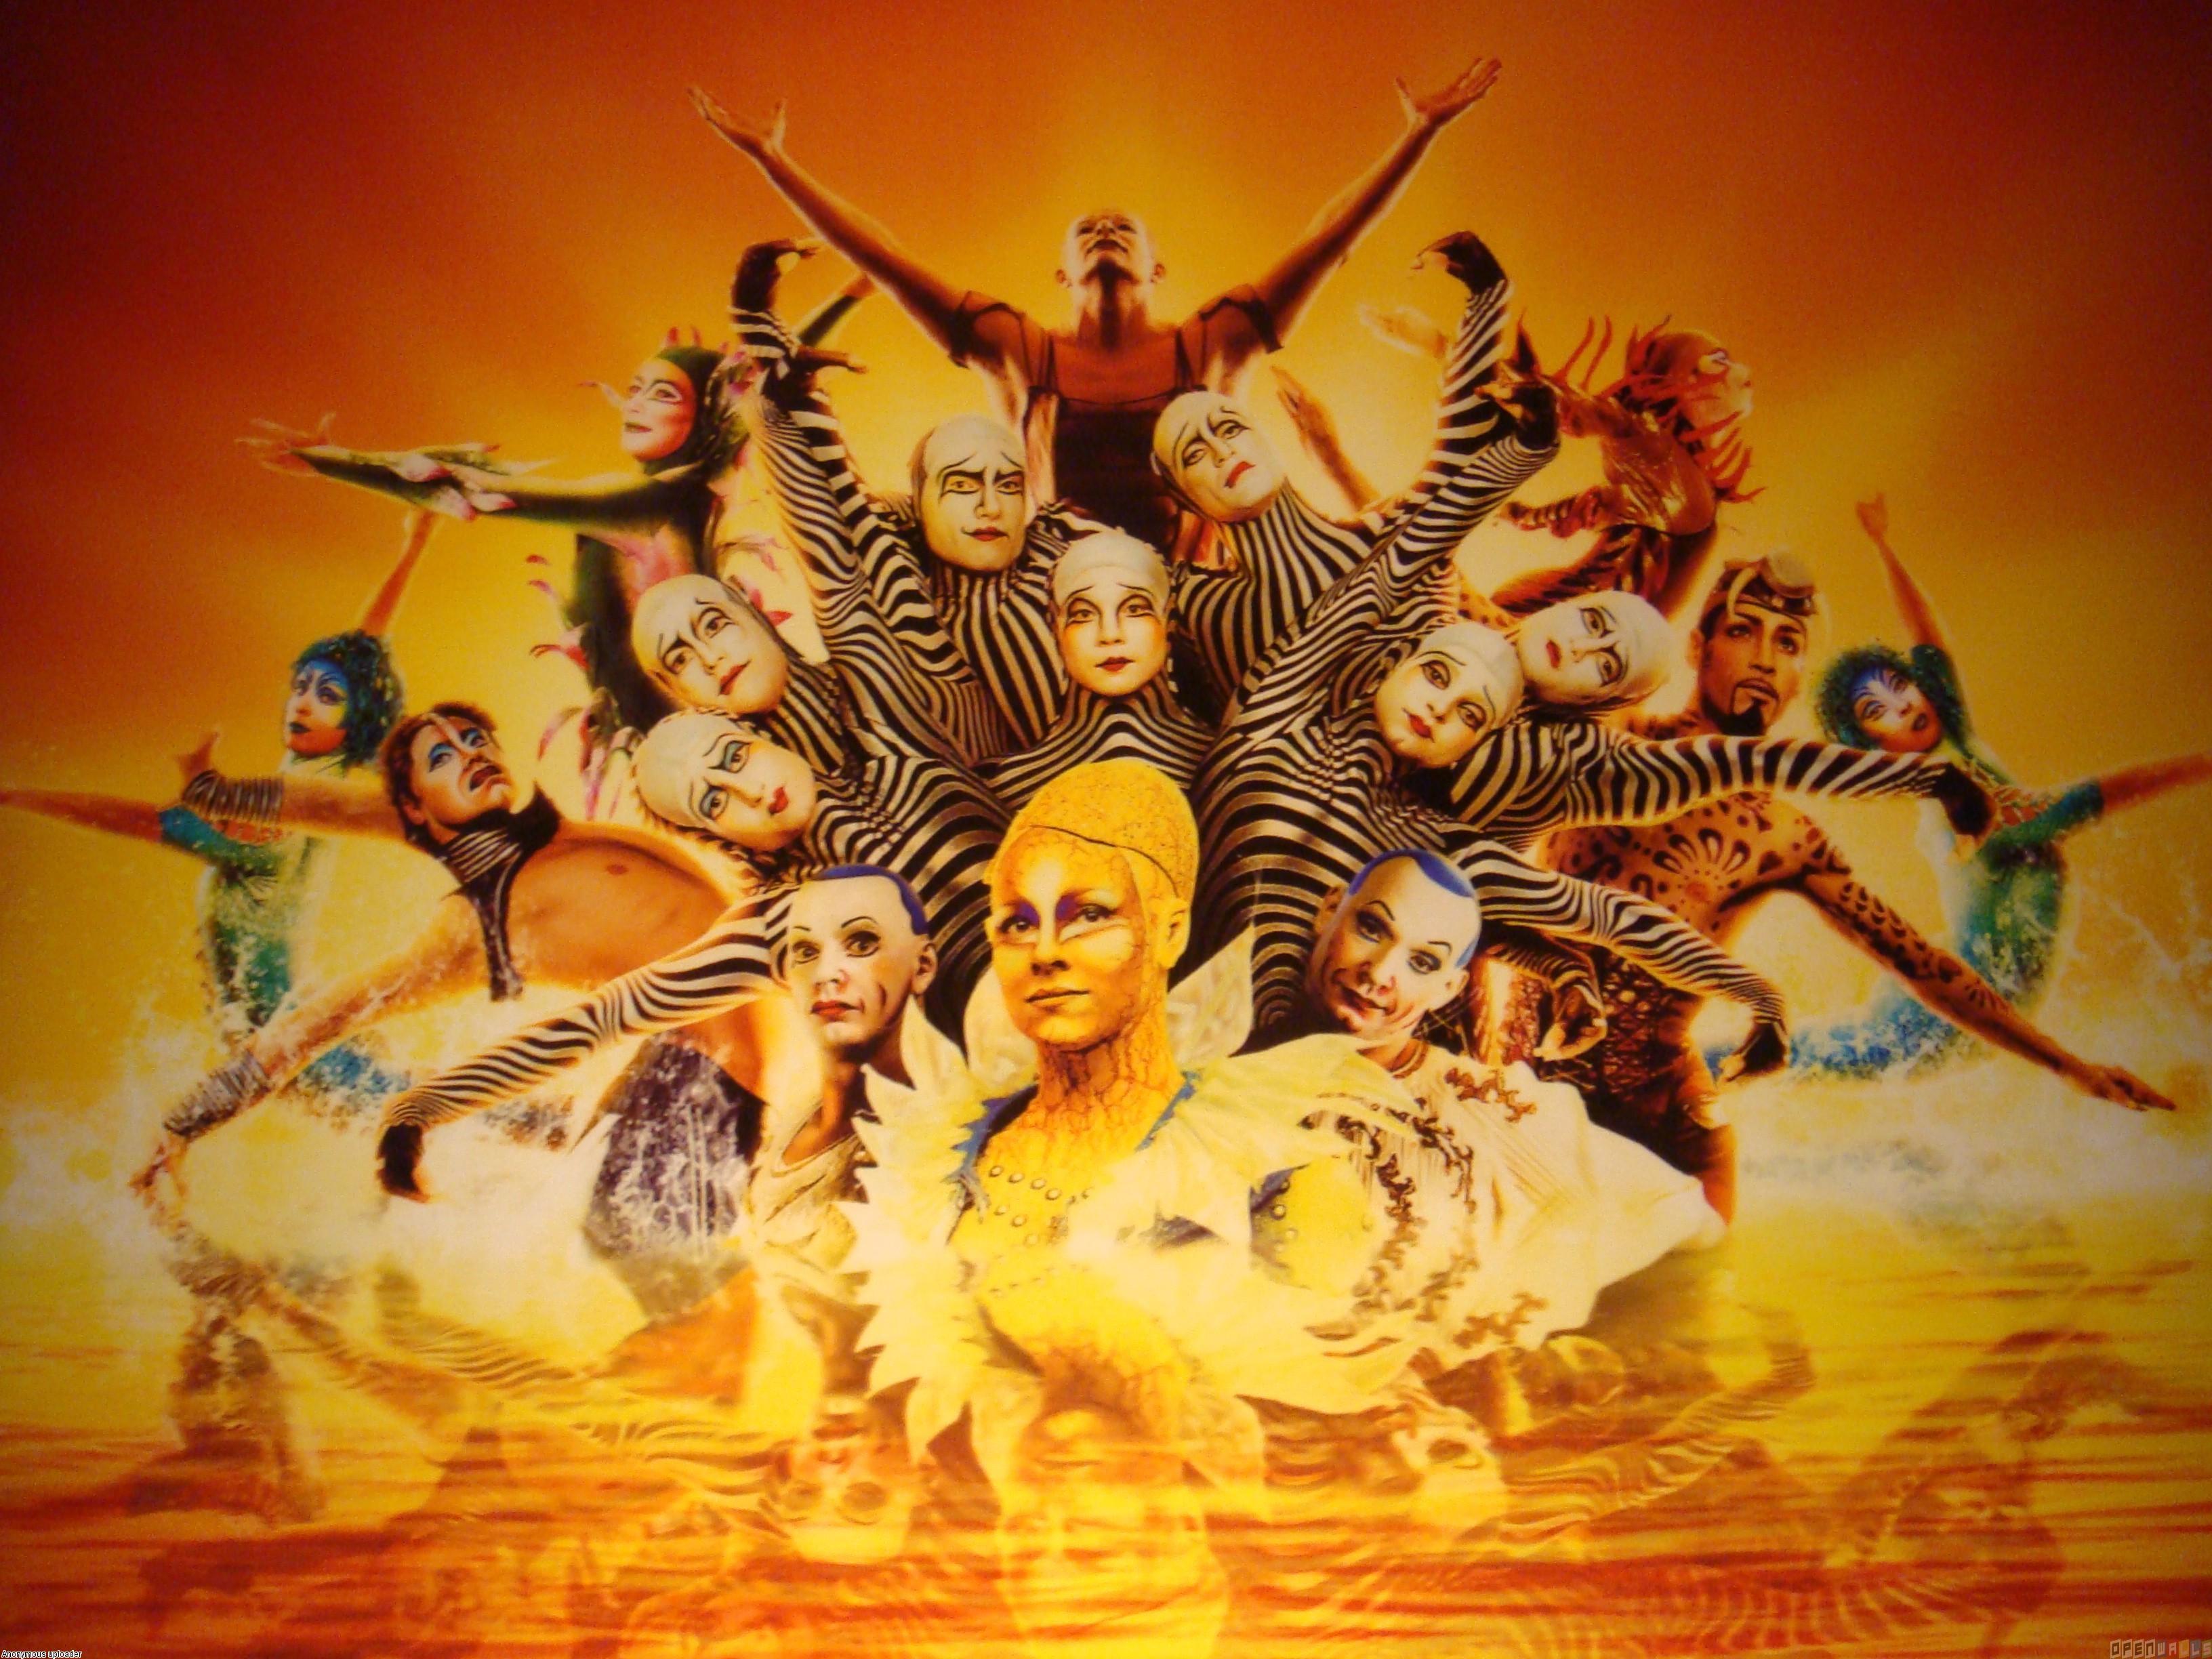 Cirque du soleil wallpaper 3264x2448